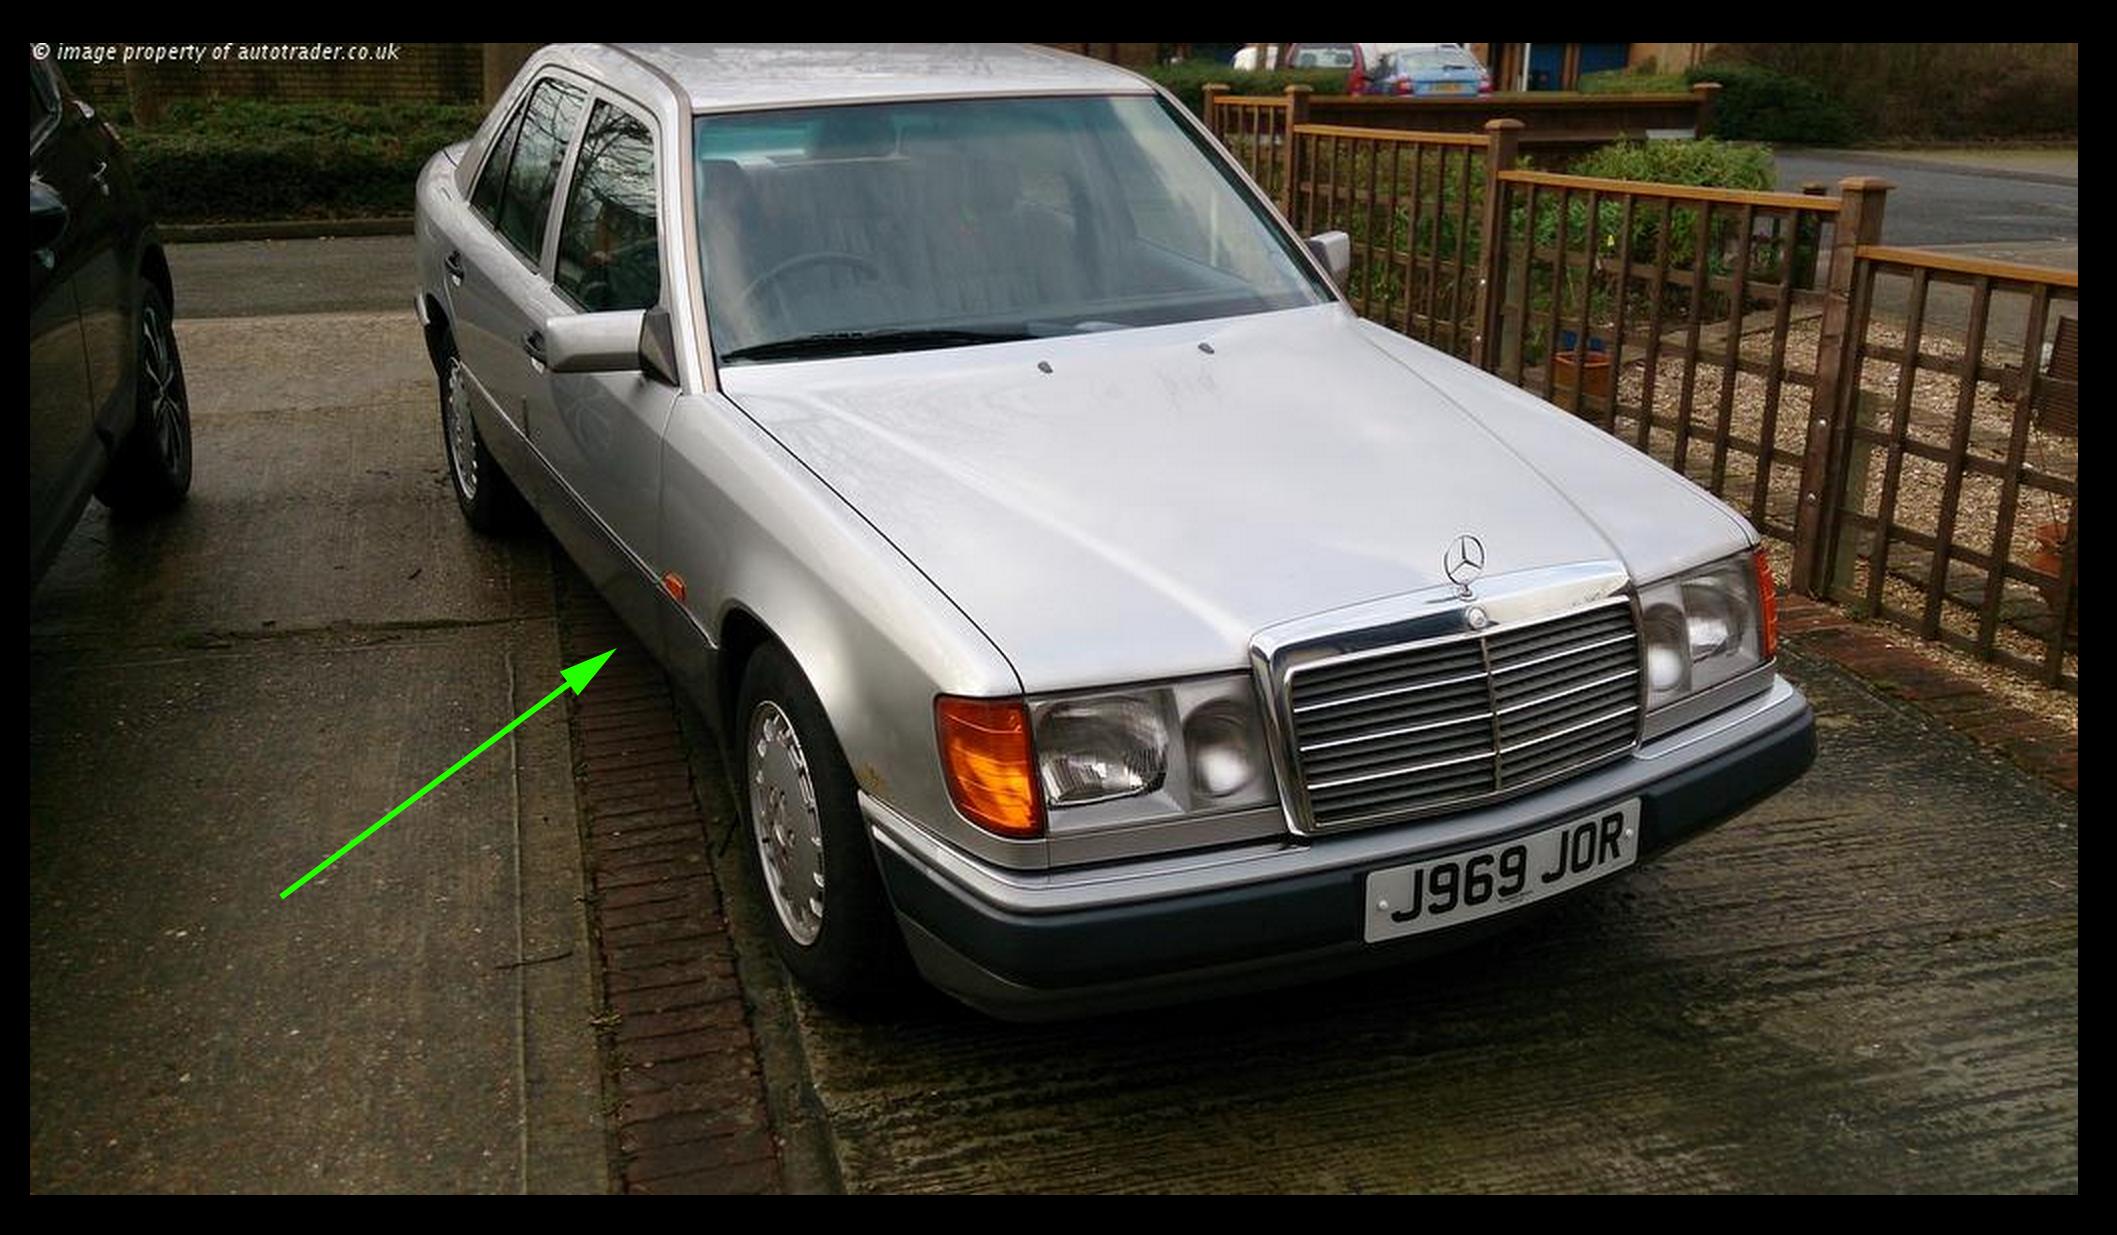 Mercedes W-124 UK model